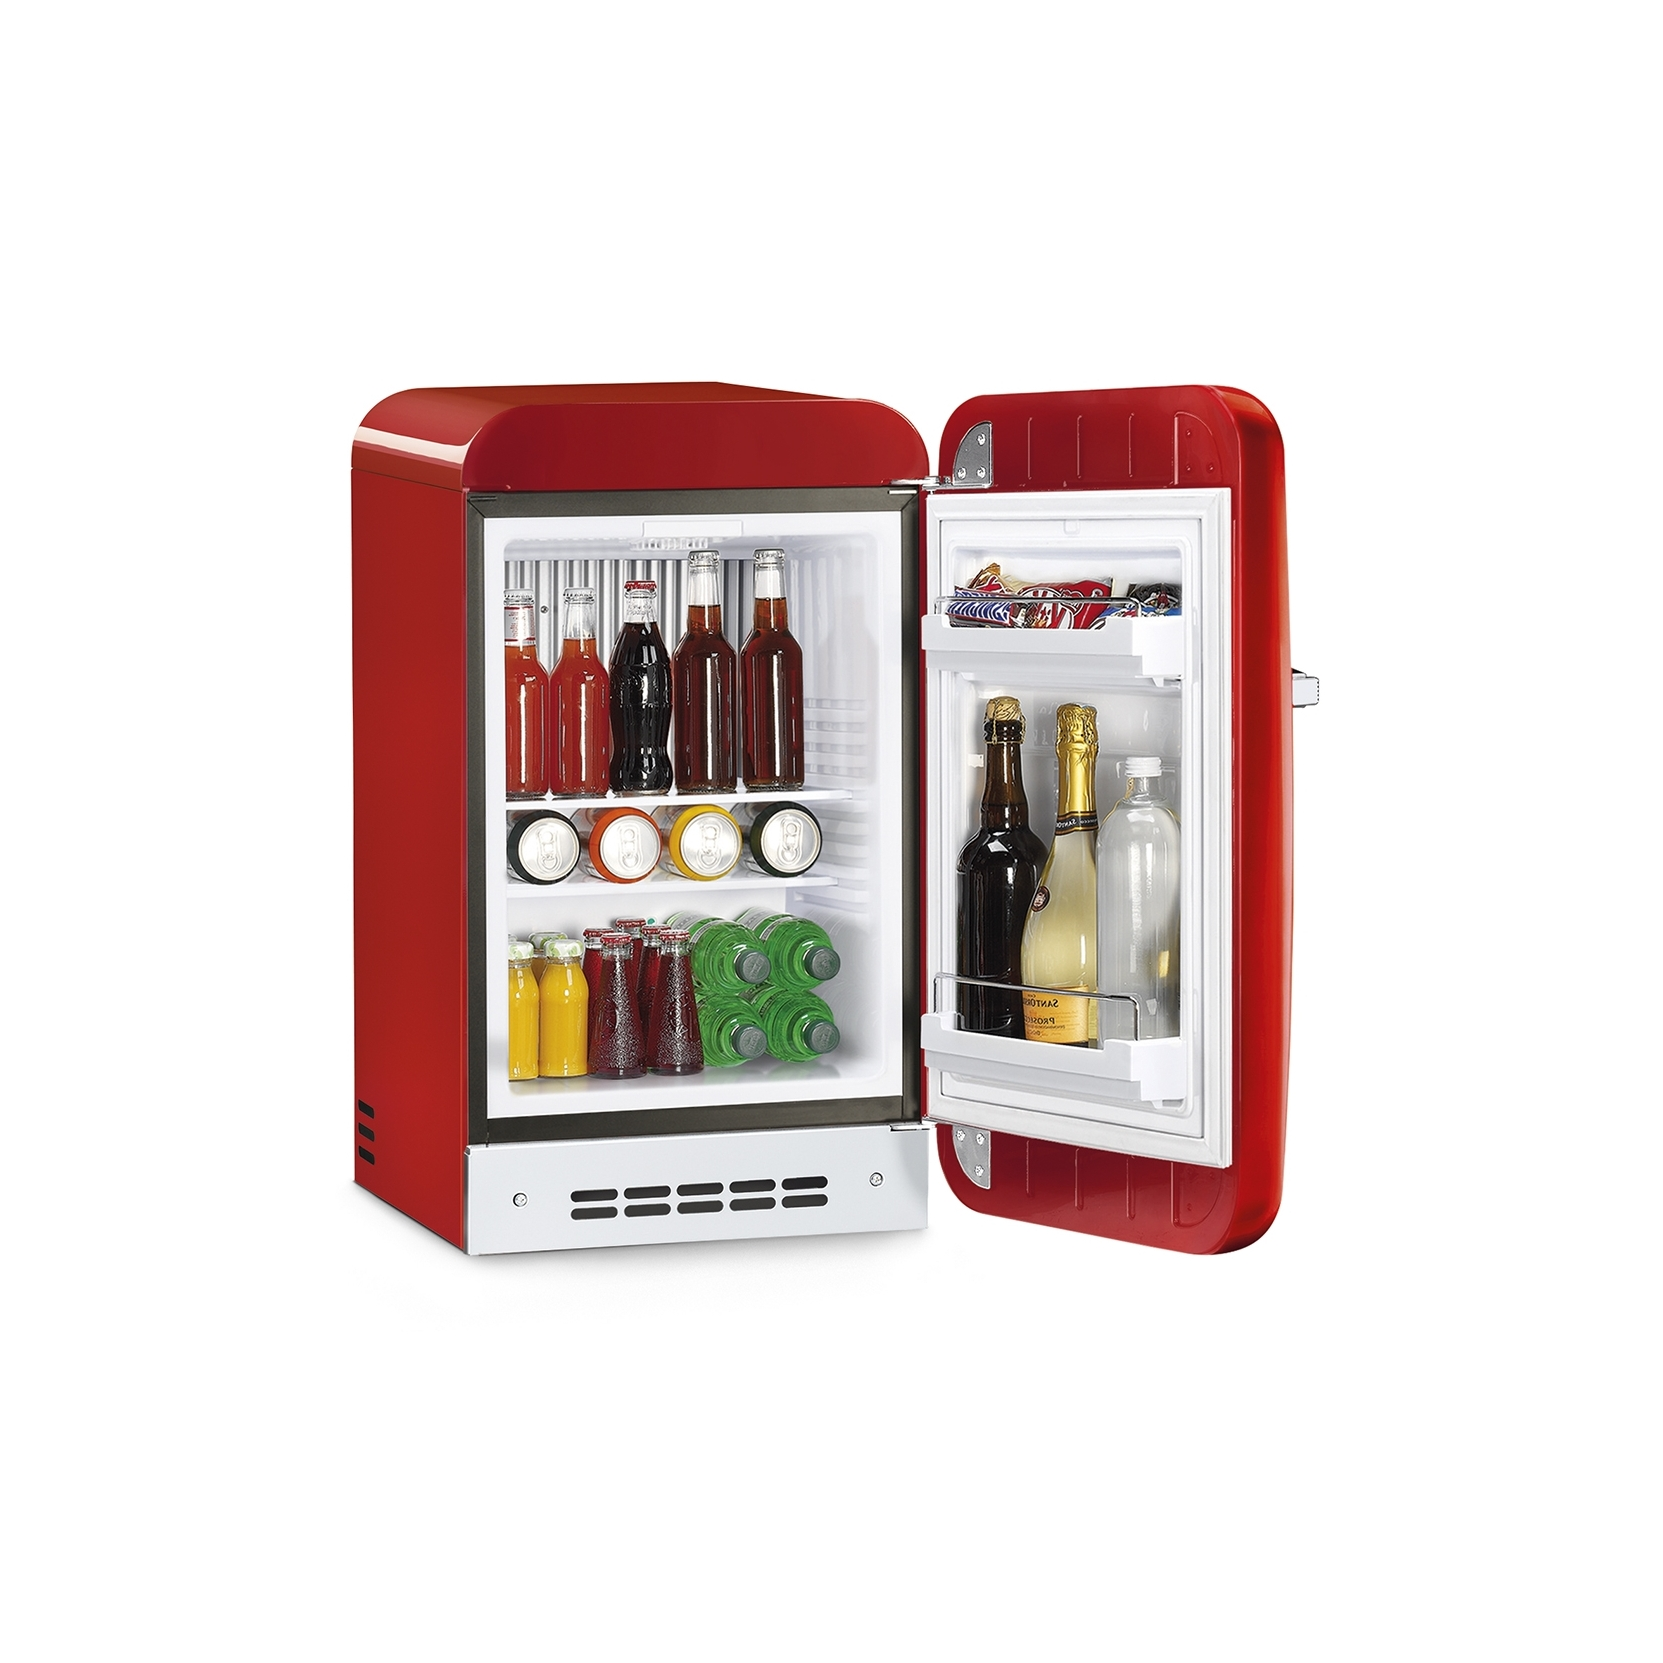 Smeg Minibar 50 S Retro Style Red Tattahome